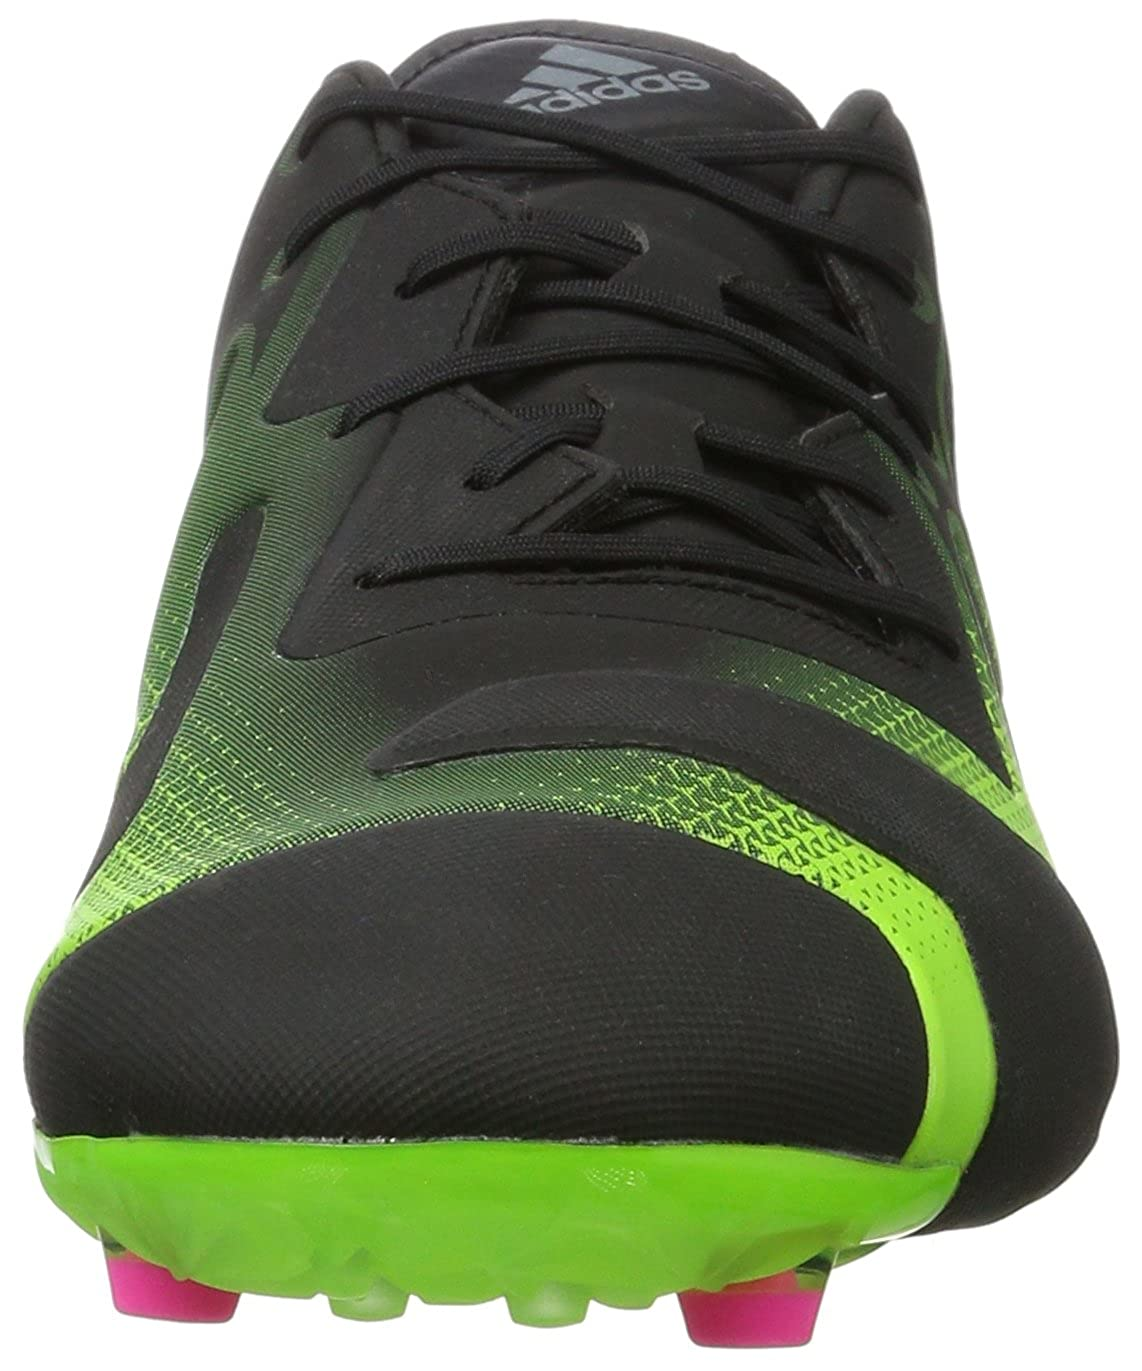 106a76f21e74 Amazon.com   adidas Ace 16+ TKRZ Mens Artificial Grass Soccer Cleats, Size  8.5 Black   Soccer